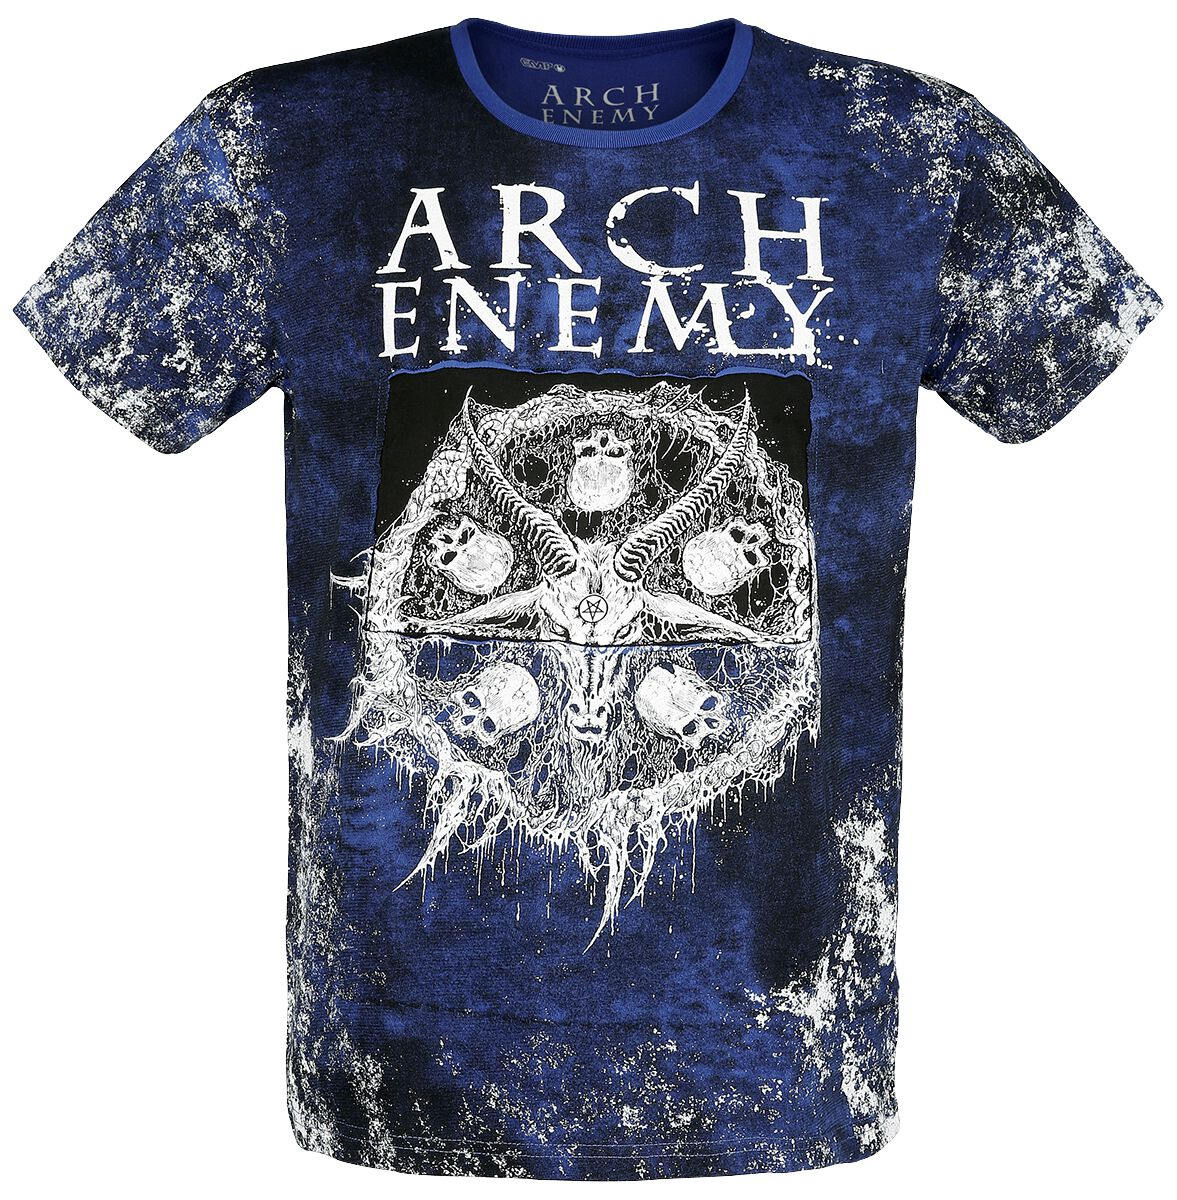 Image of Arch Enemy EMP Signature Collection T-Shirt blau/grau